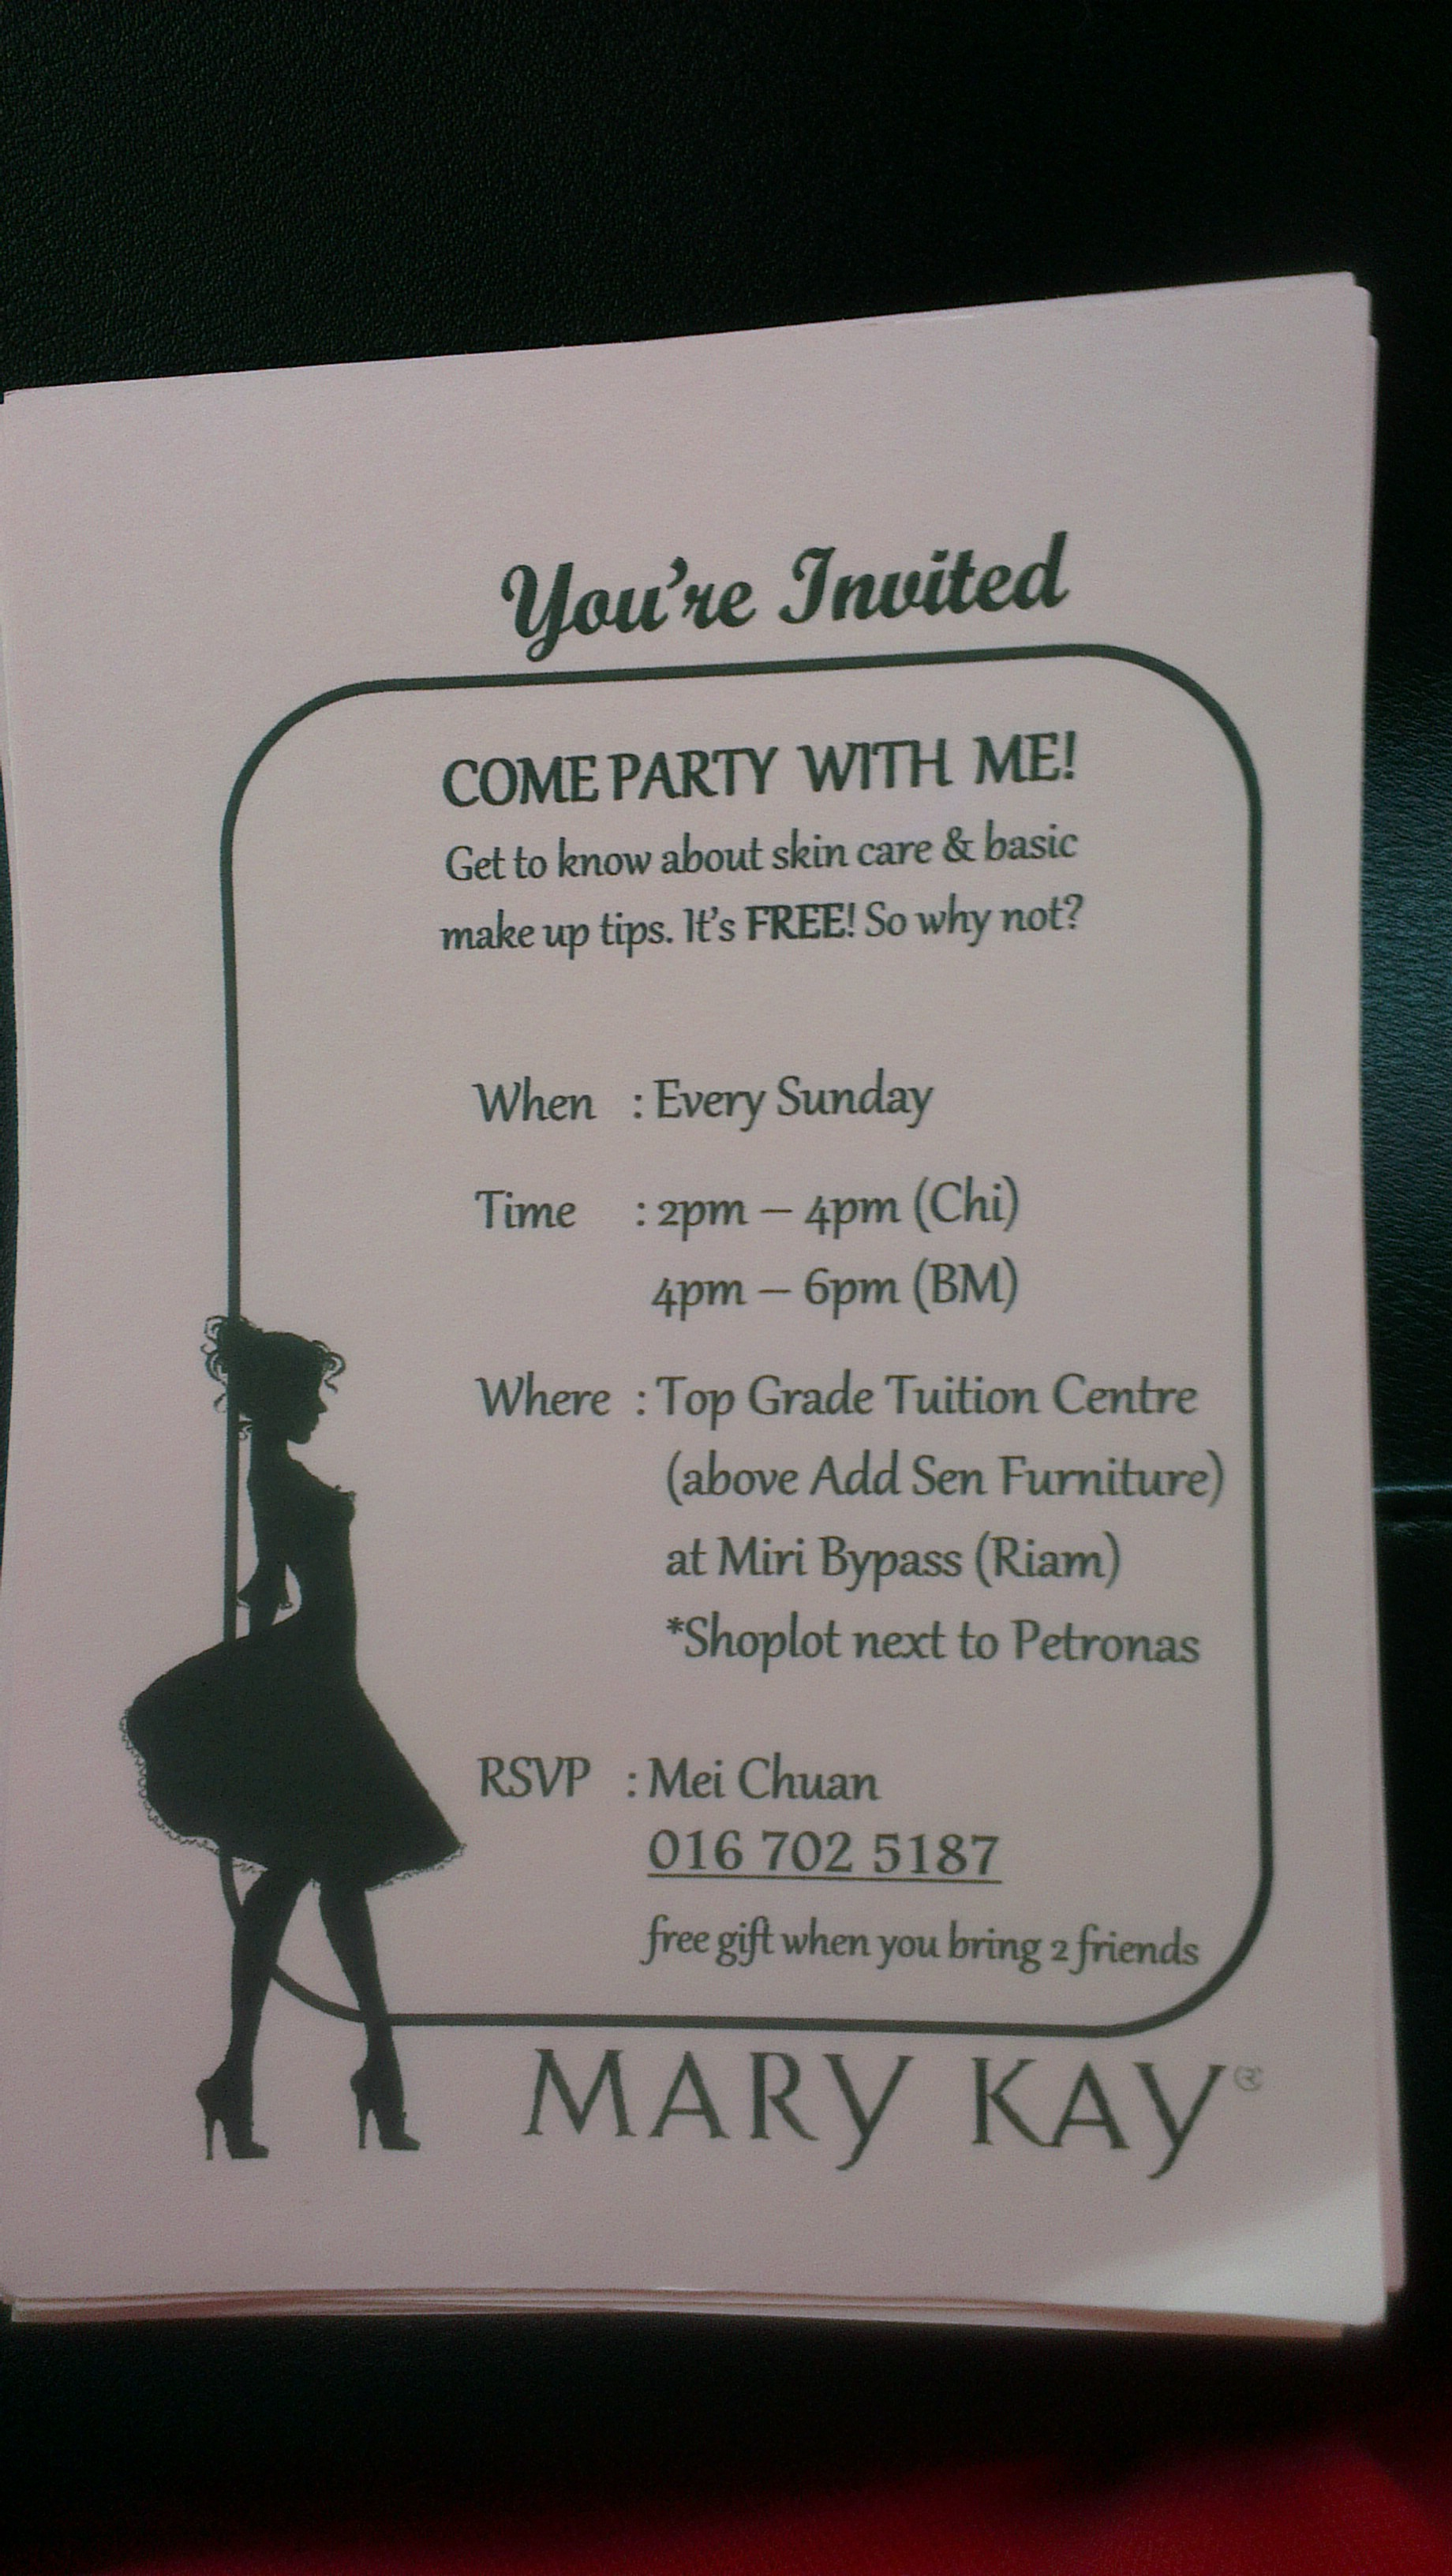 Mary kay skin care class invitation jobs miricommunity imag1367g1840x3264 988 kb stopboris Choice Image